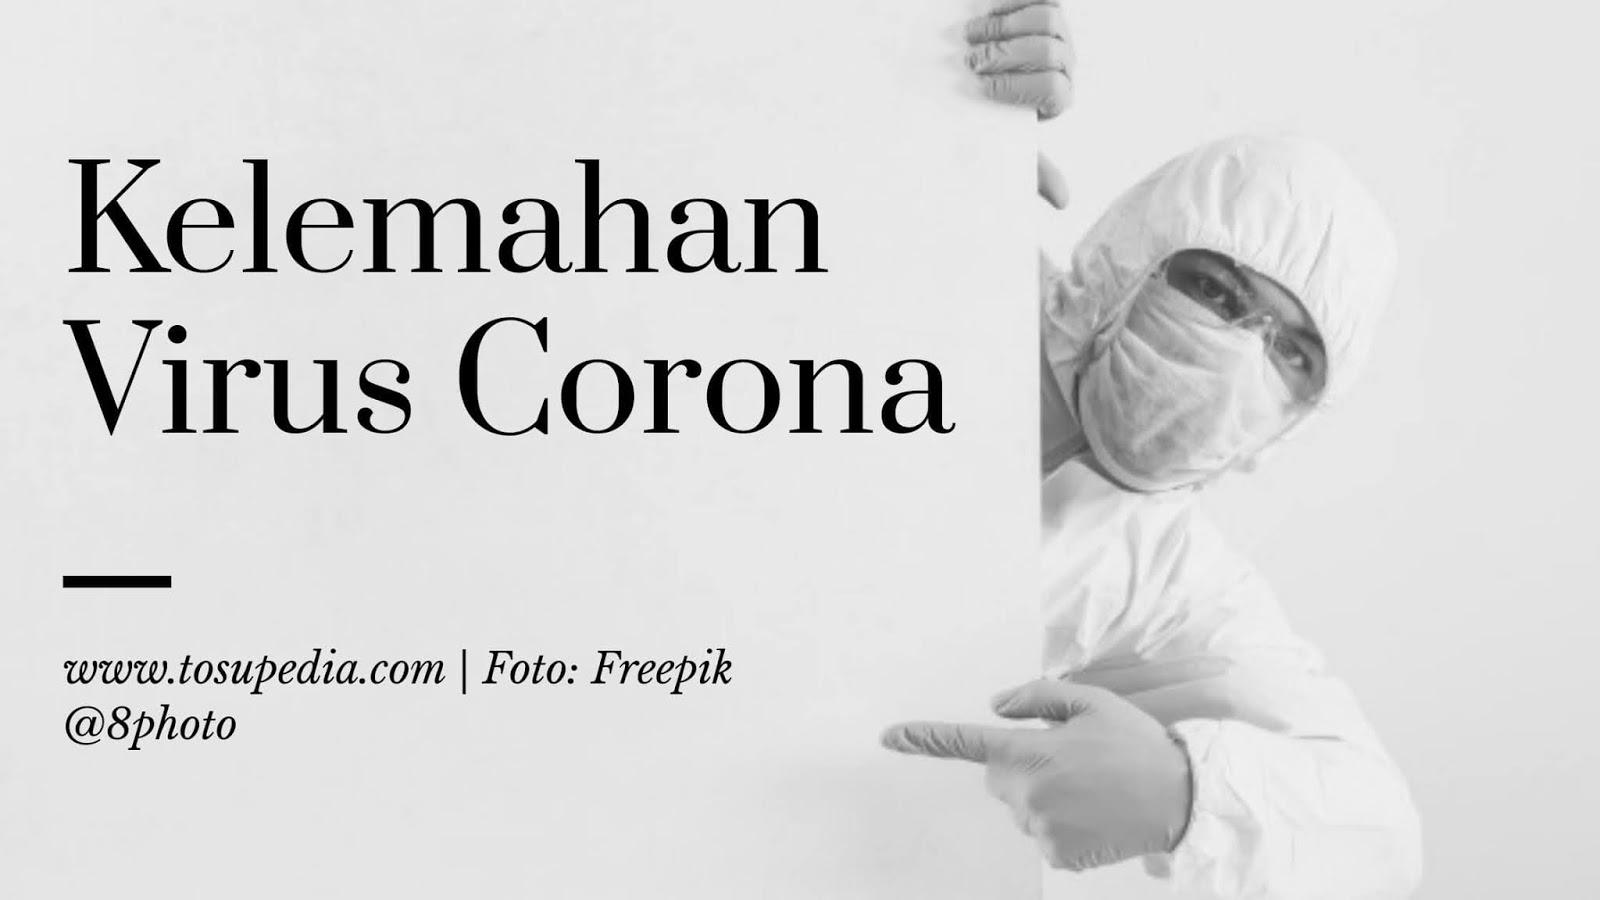 ilmuwan-rusia-mengklaim-telah-menemukan-kelemahan-virus-corona